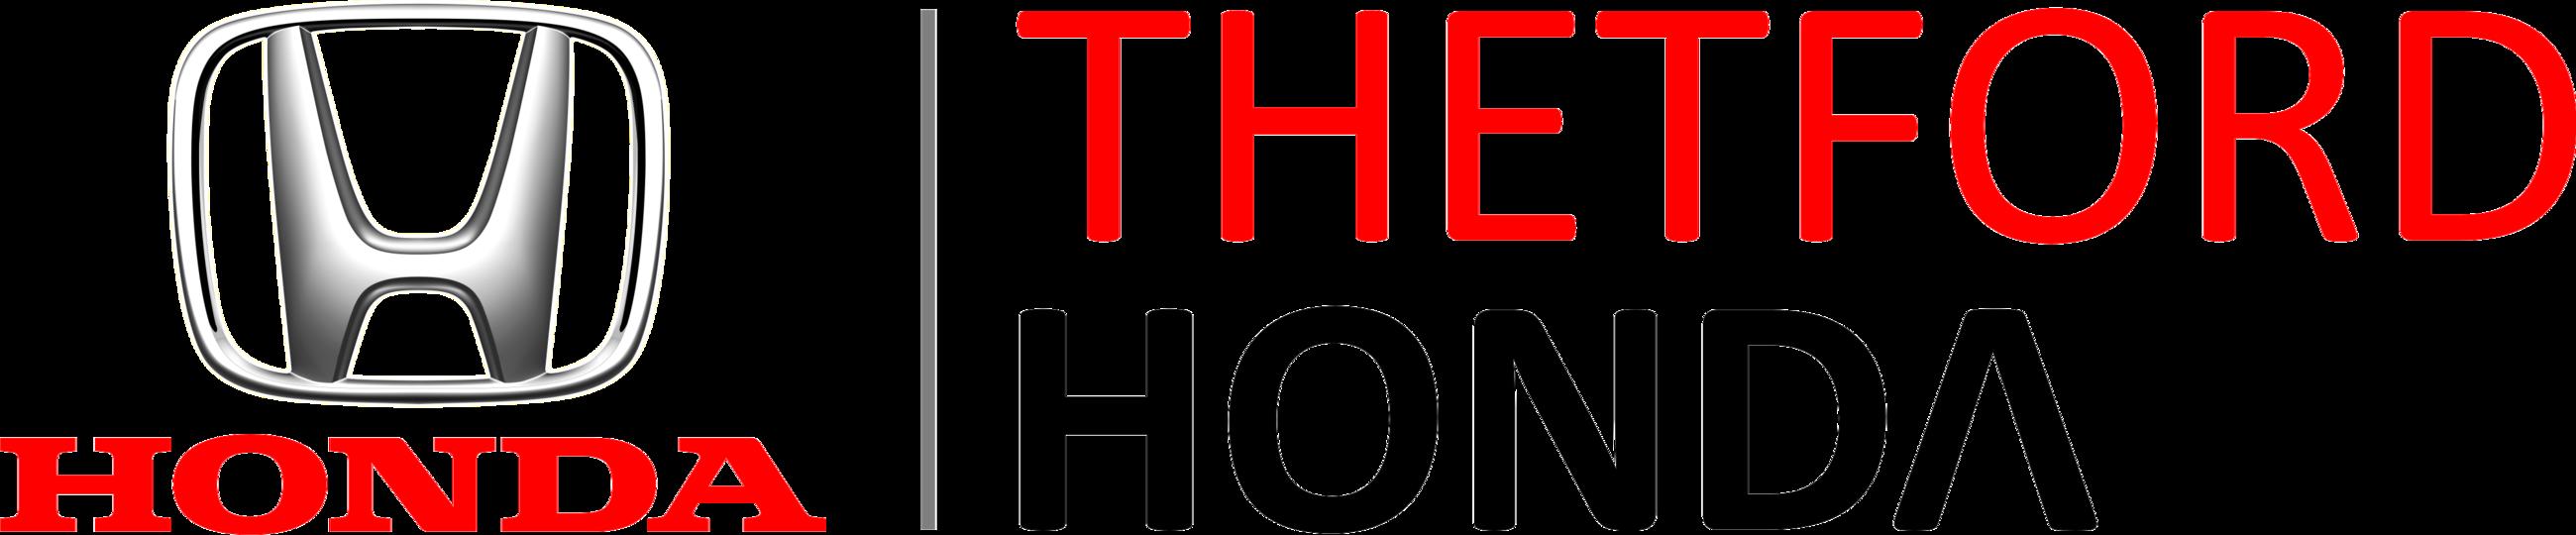 Thetford Honda